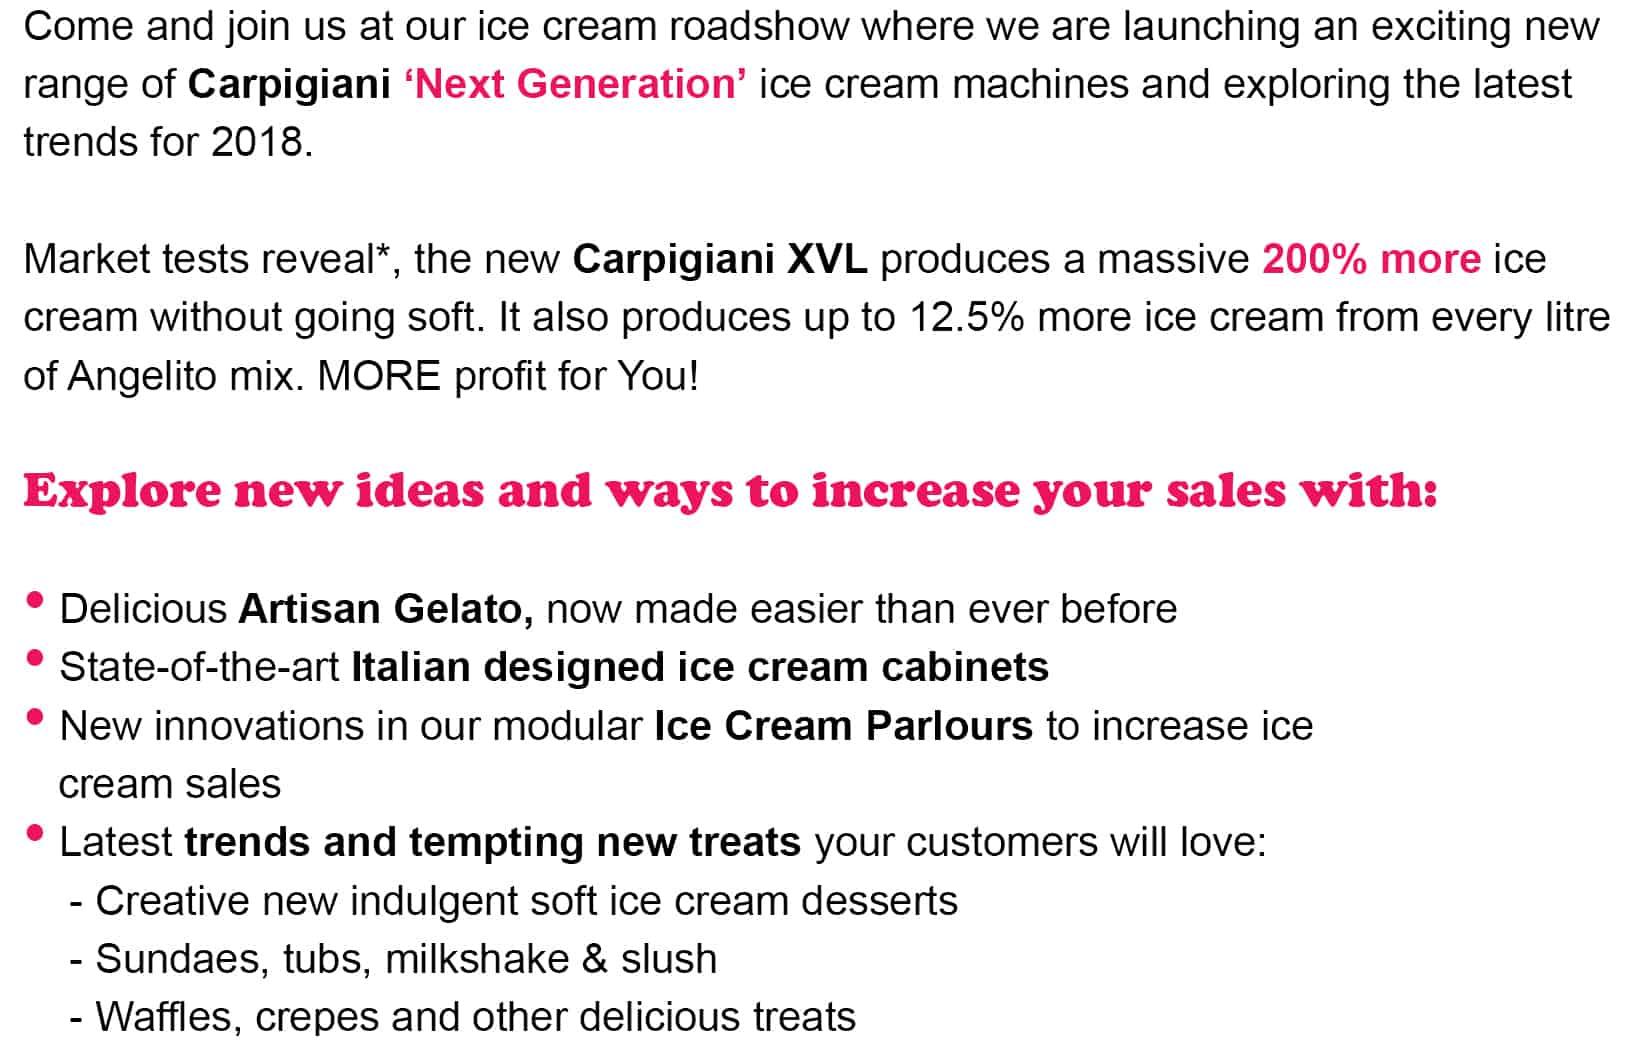 Text For Ice Cream Roadshows